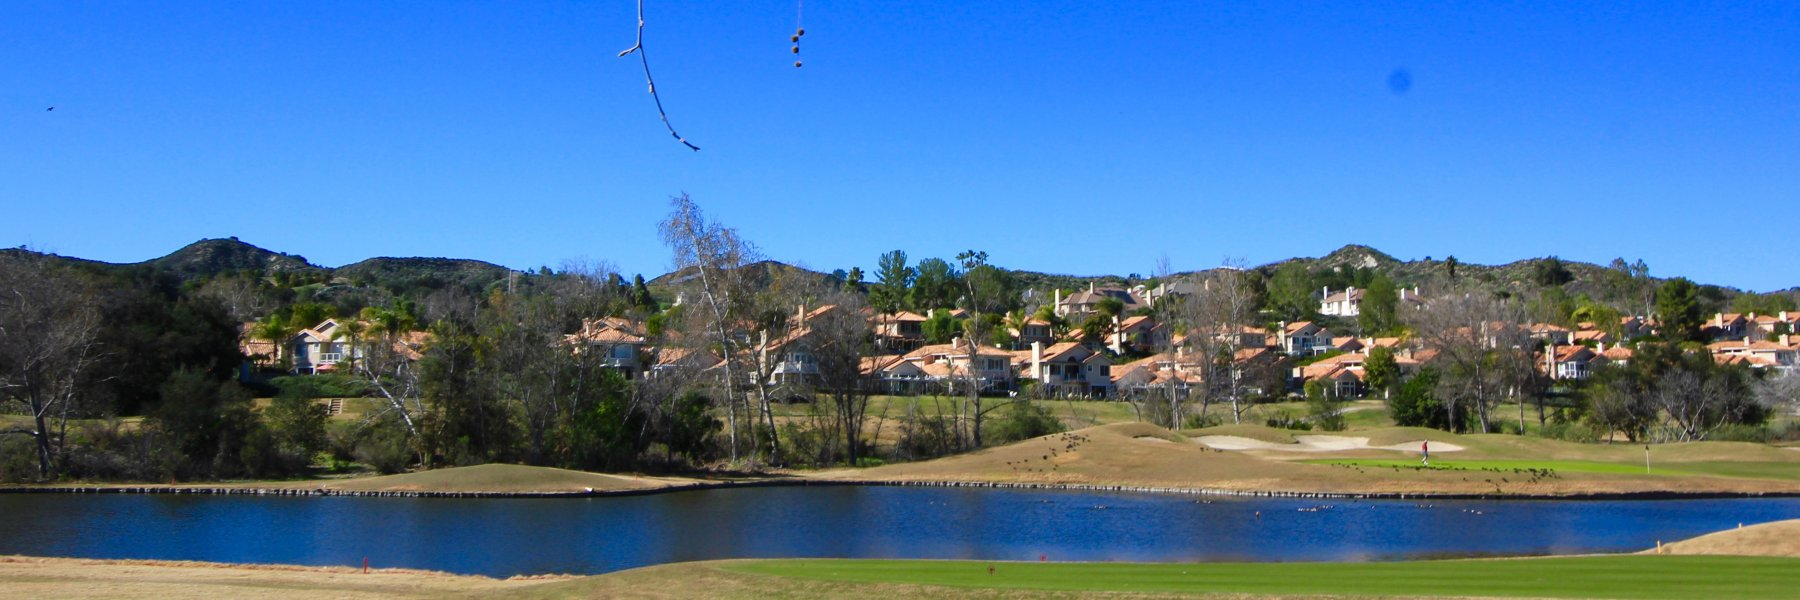 Fairway Oaks is a community of homes in Coto de Caza, California